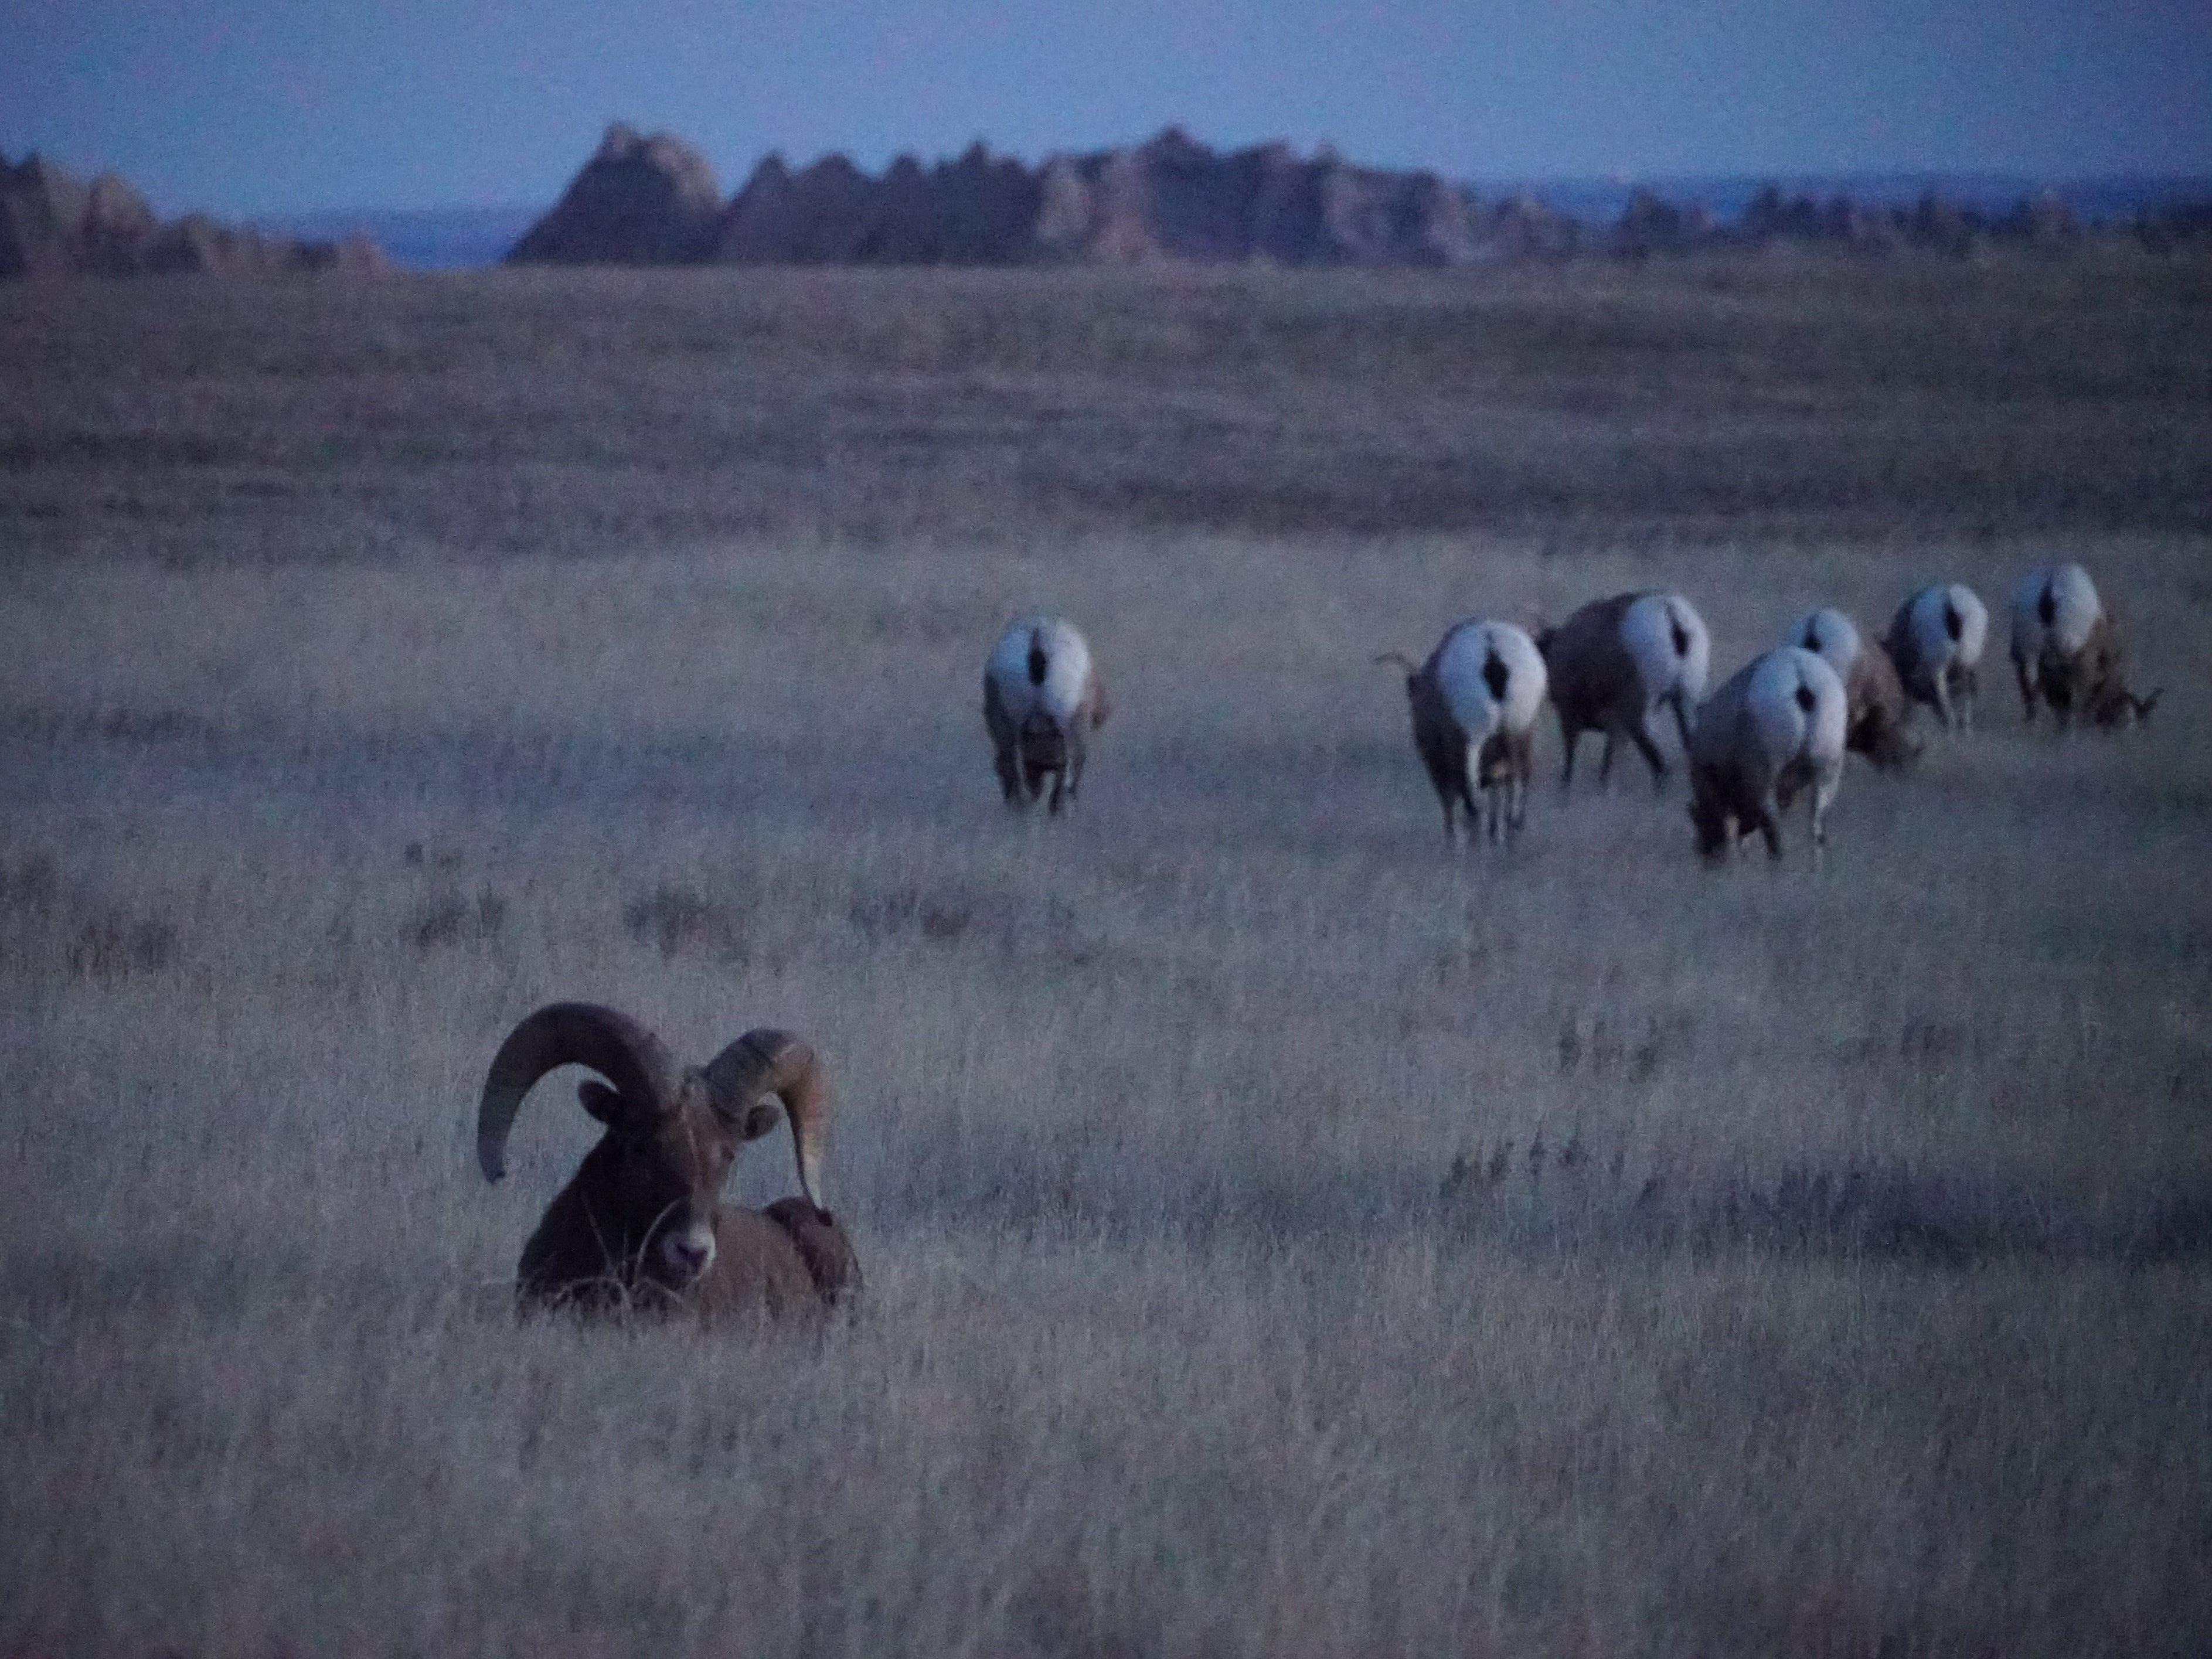 Bighorn sheep roam free in Badlands National Park.